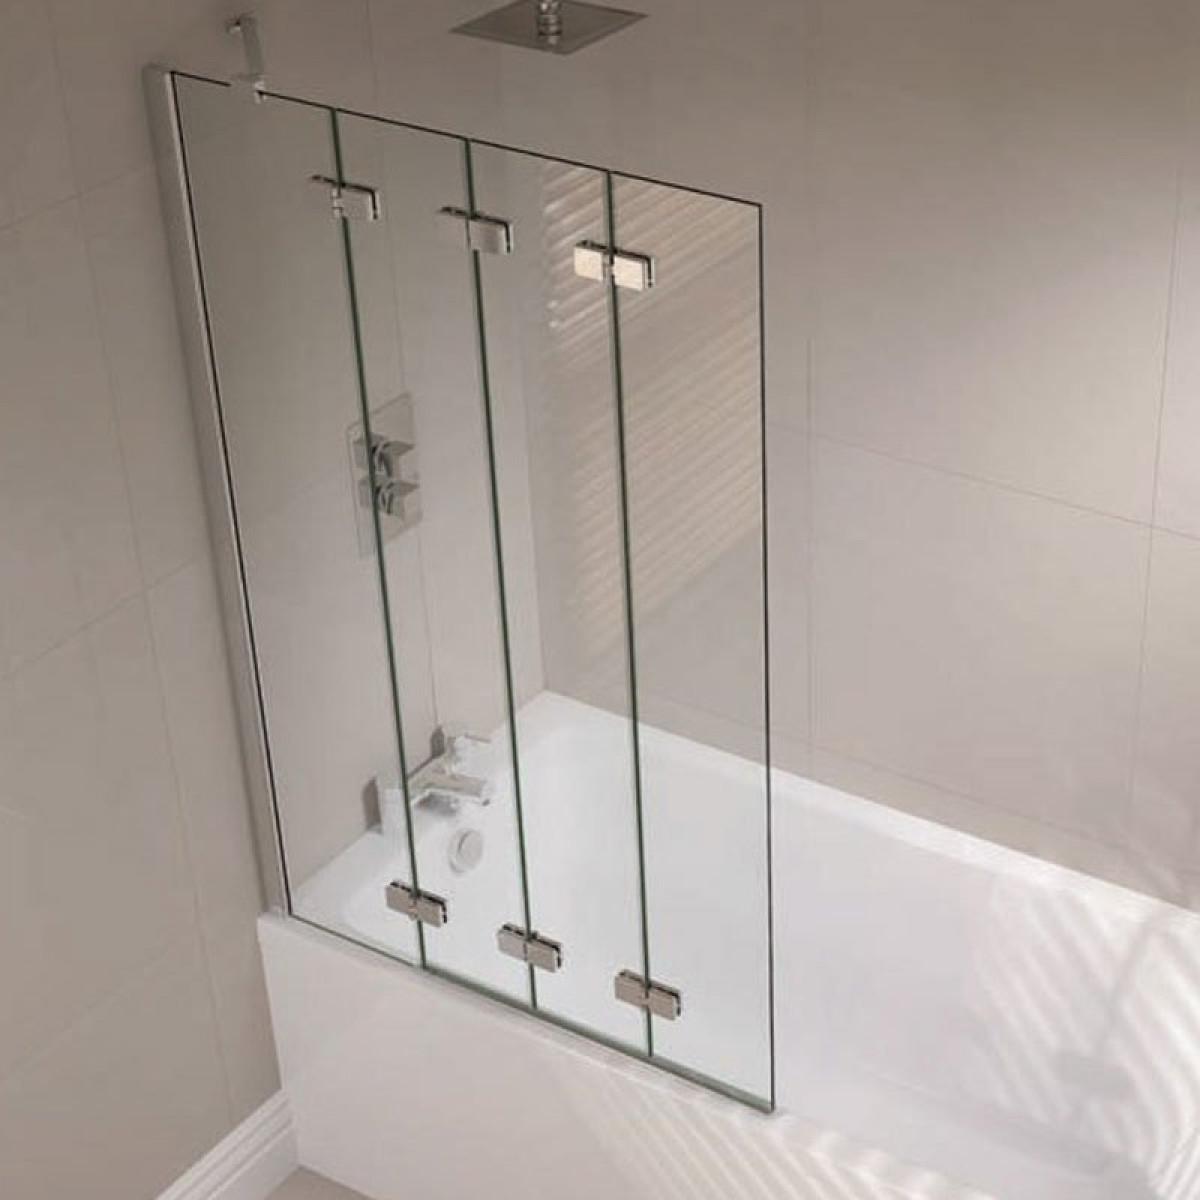 Cool Curved Shower Panel Gallery Bathtub For Bathroom